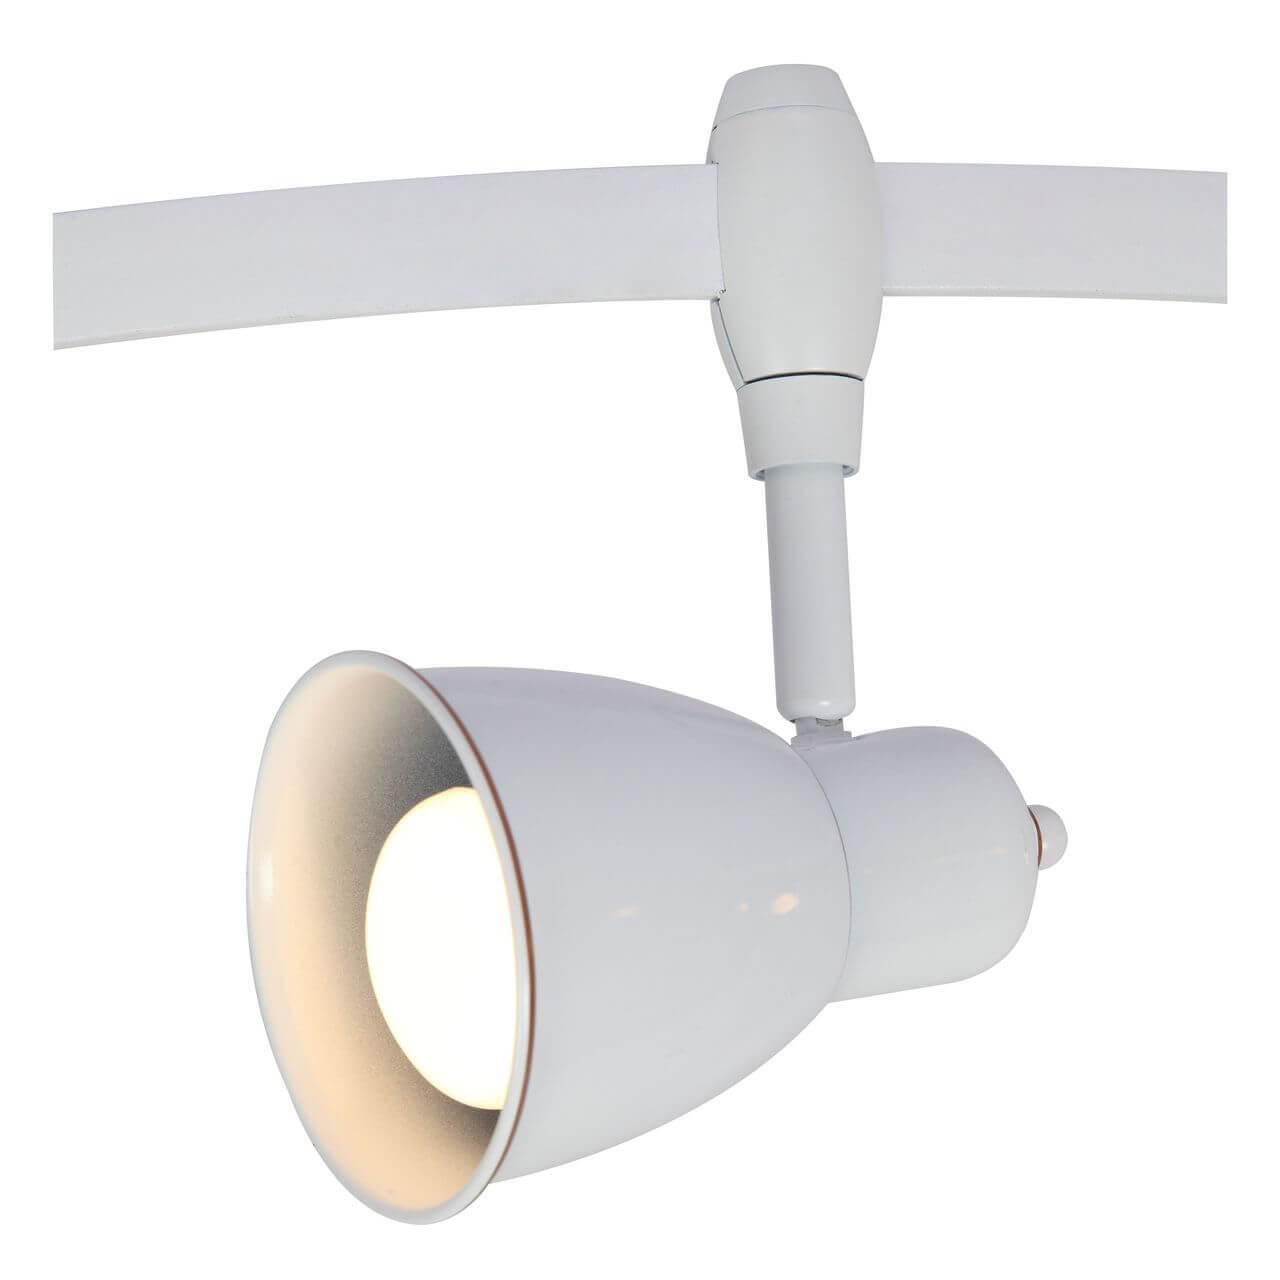 Светильник Arte Lamp A3058PL-1WH A3058 White фото